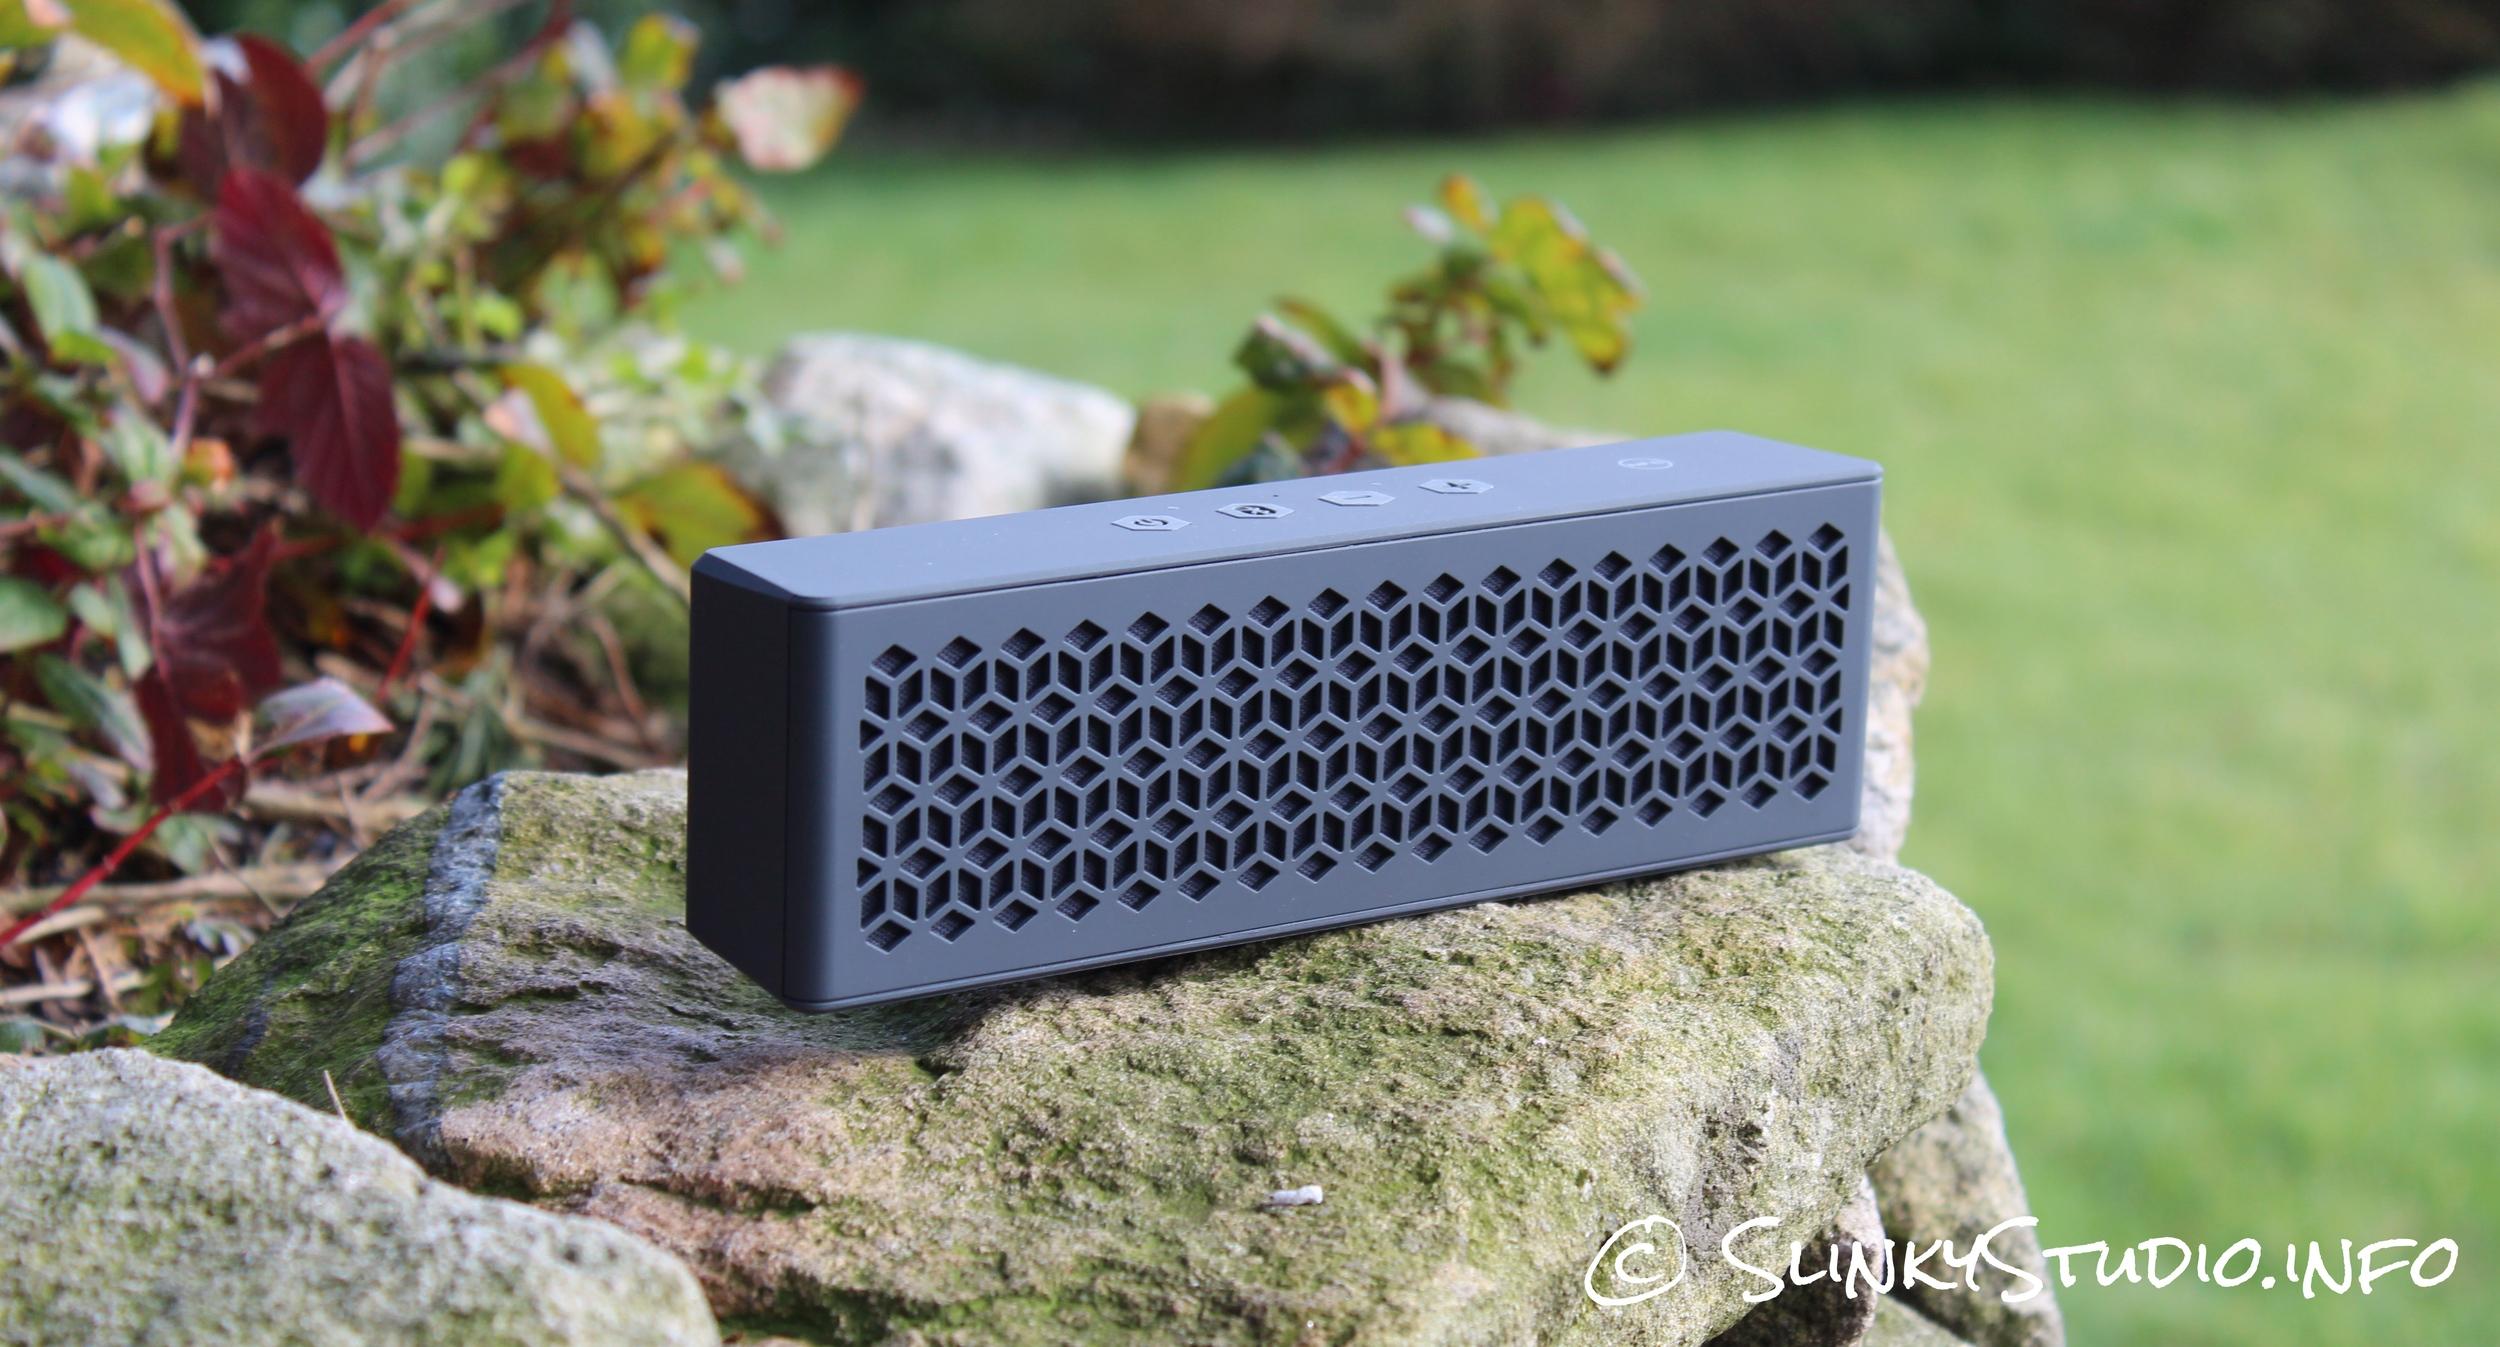 Creative MUVO mini Speaker on a stone